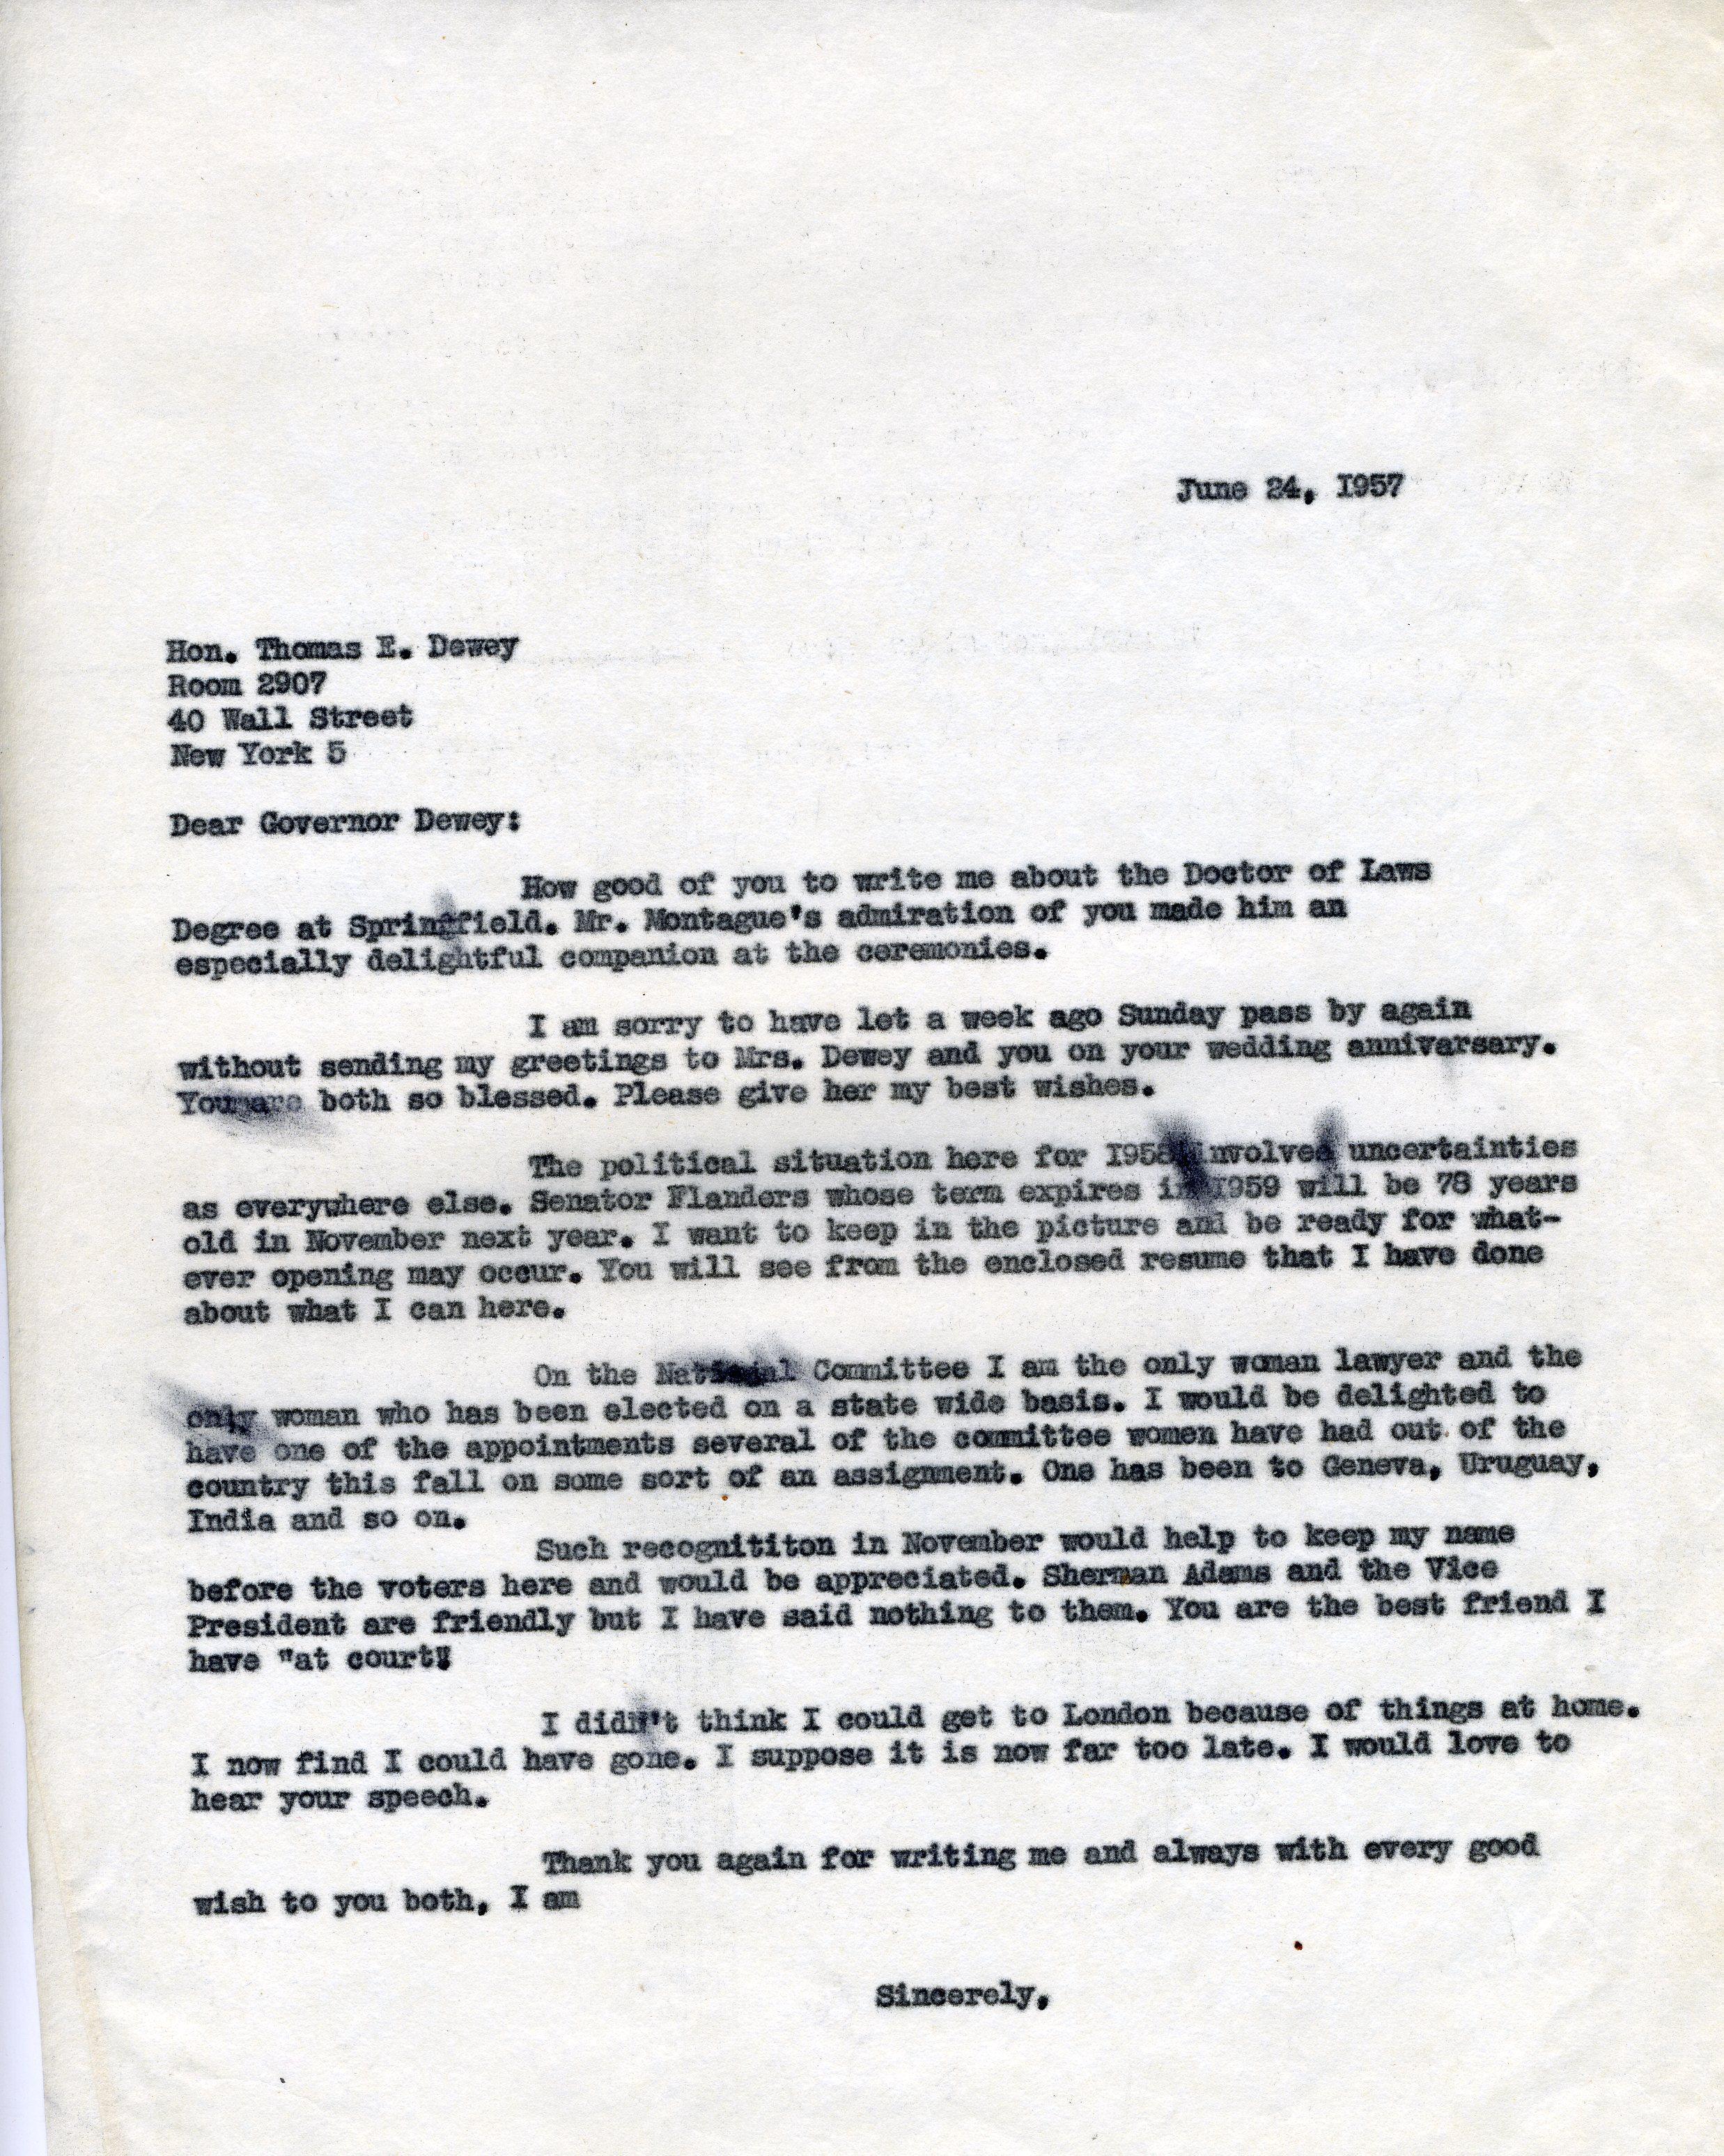 Omekactl letter from consuelo northrop bailey to thomas dewey letter from consuelo northrop bailey to thomas dewey 1957 june 24 mitanshu Gallery